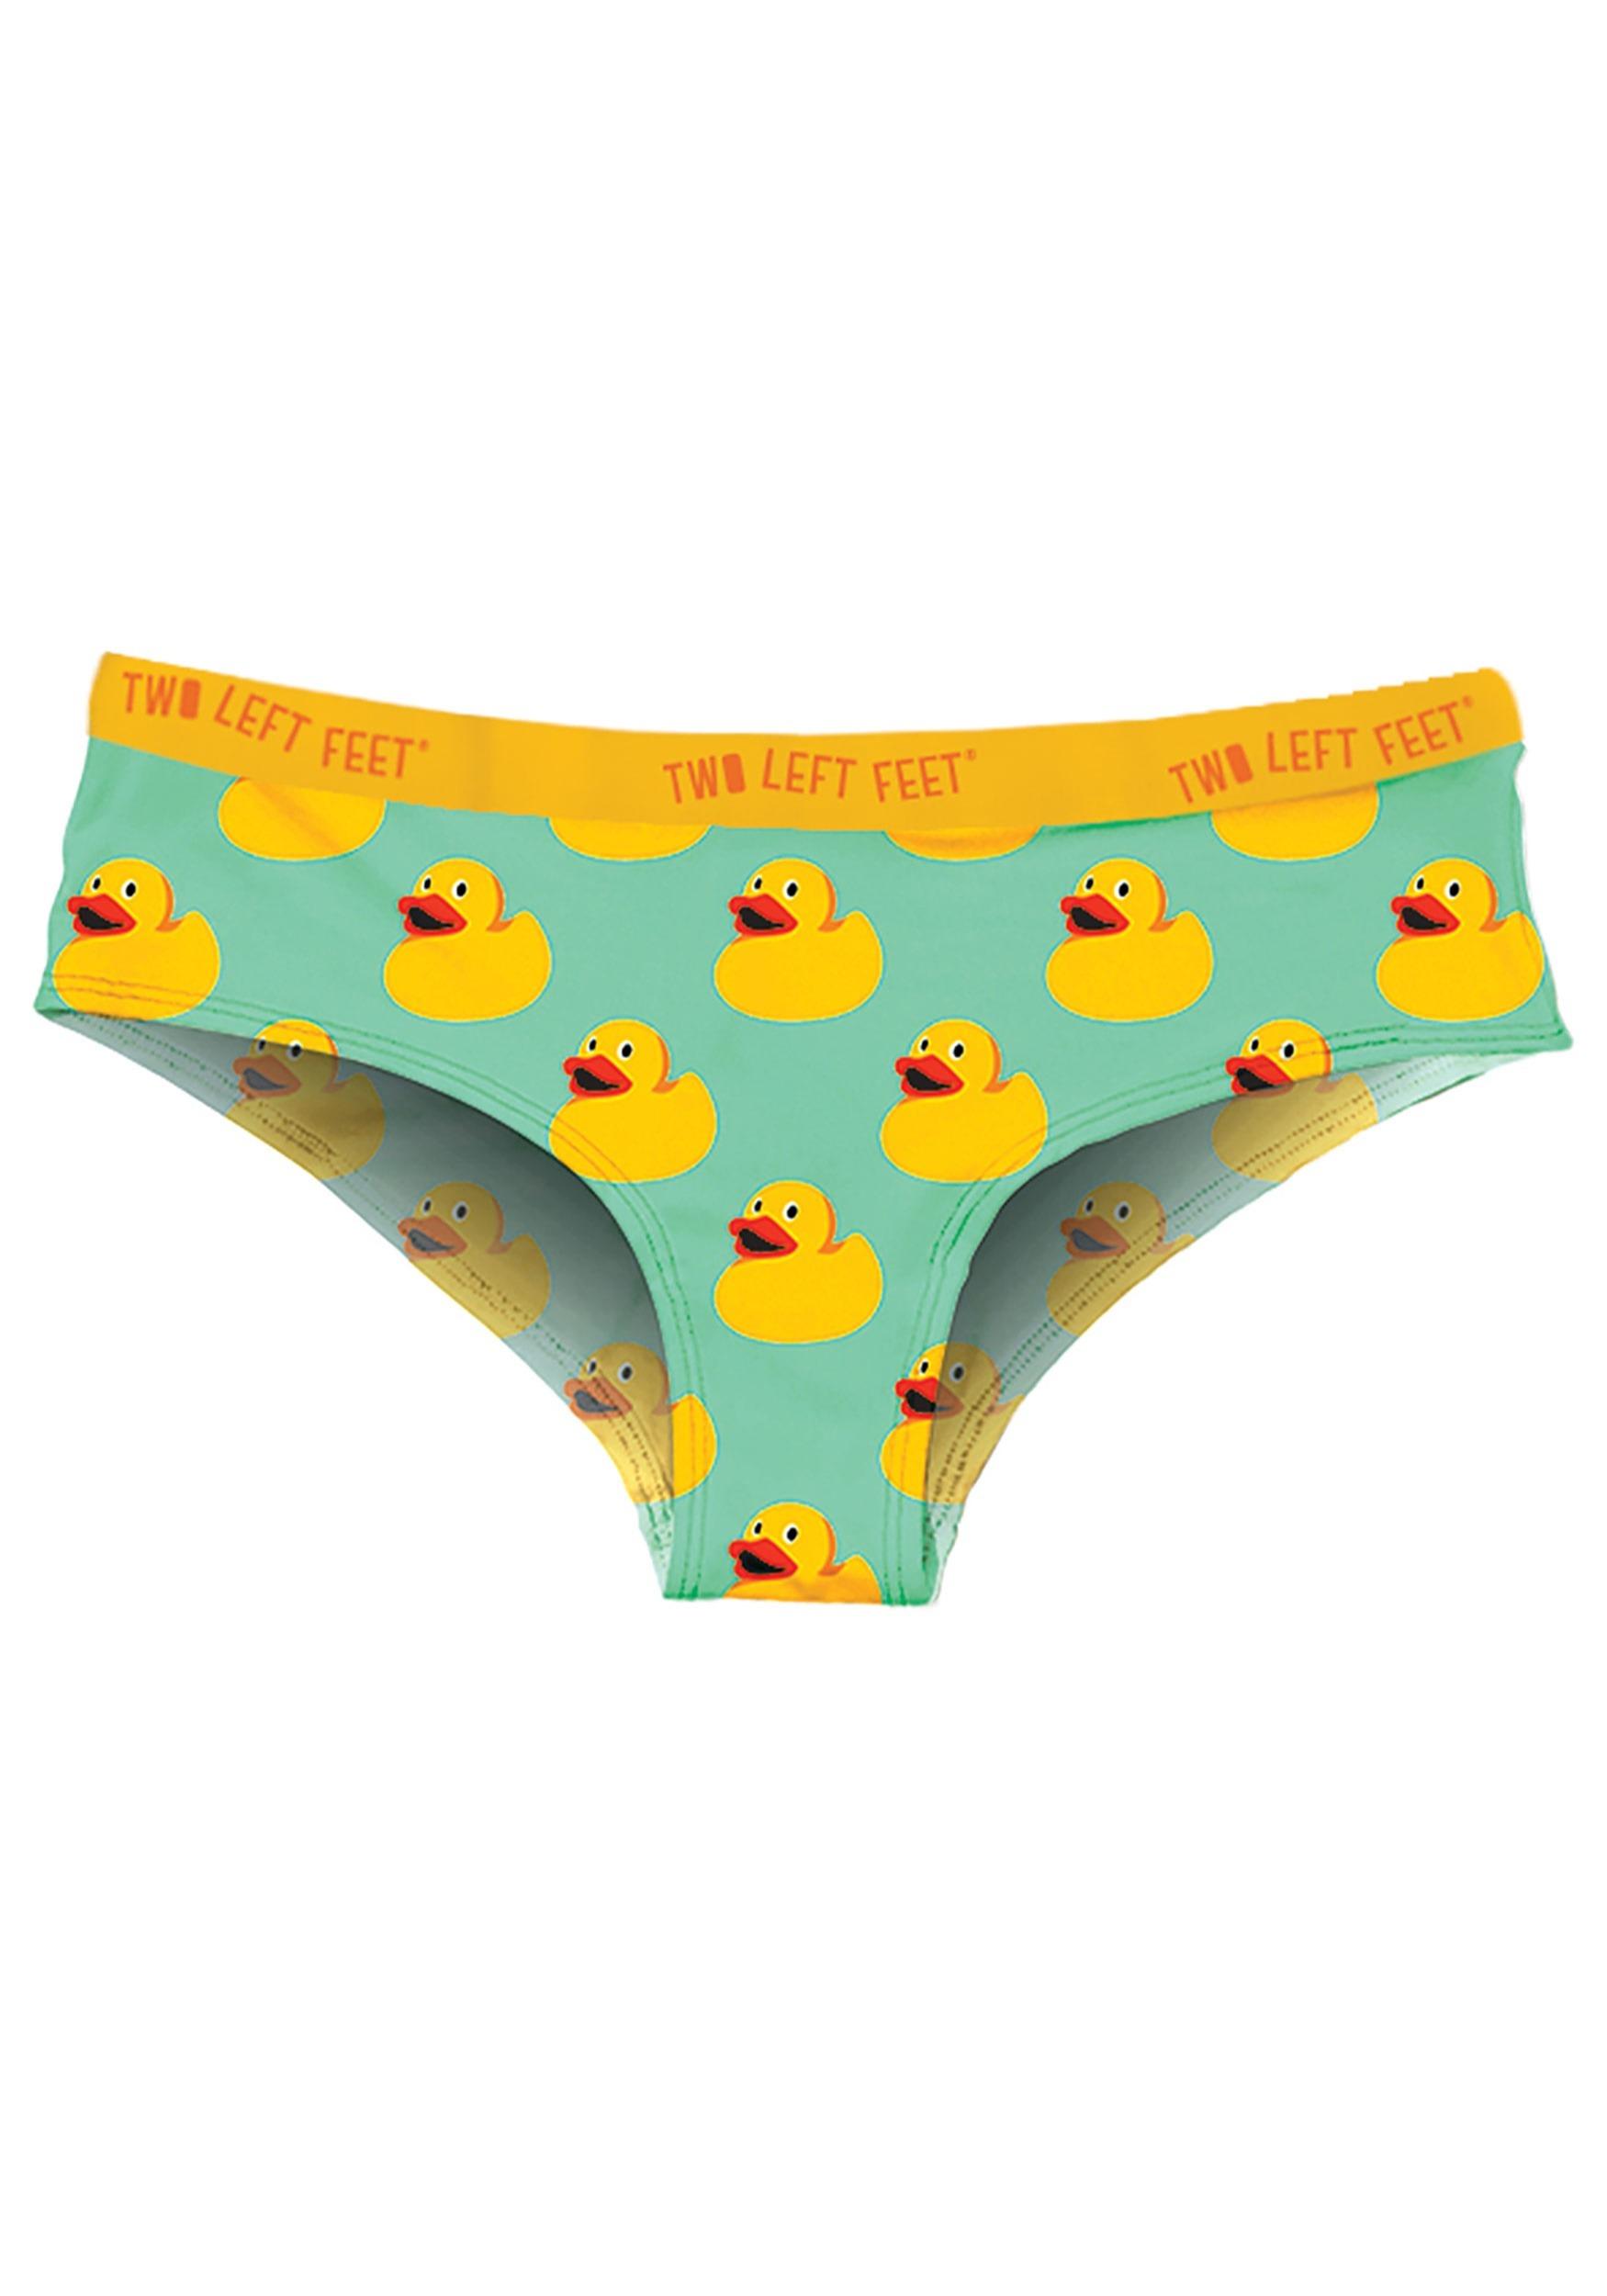 Two Left Feet Sitting Rubber Duck Womens Hipster Underwear